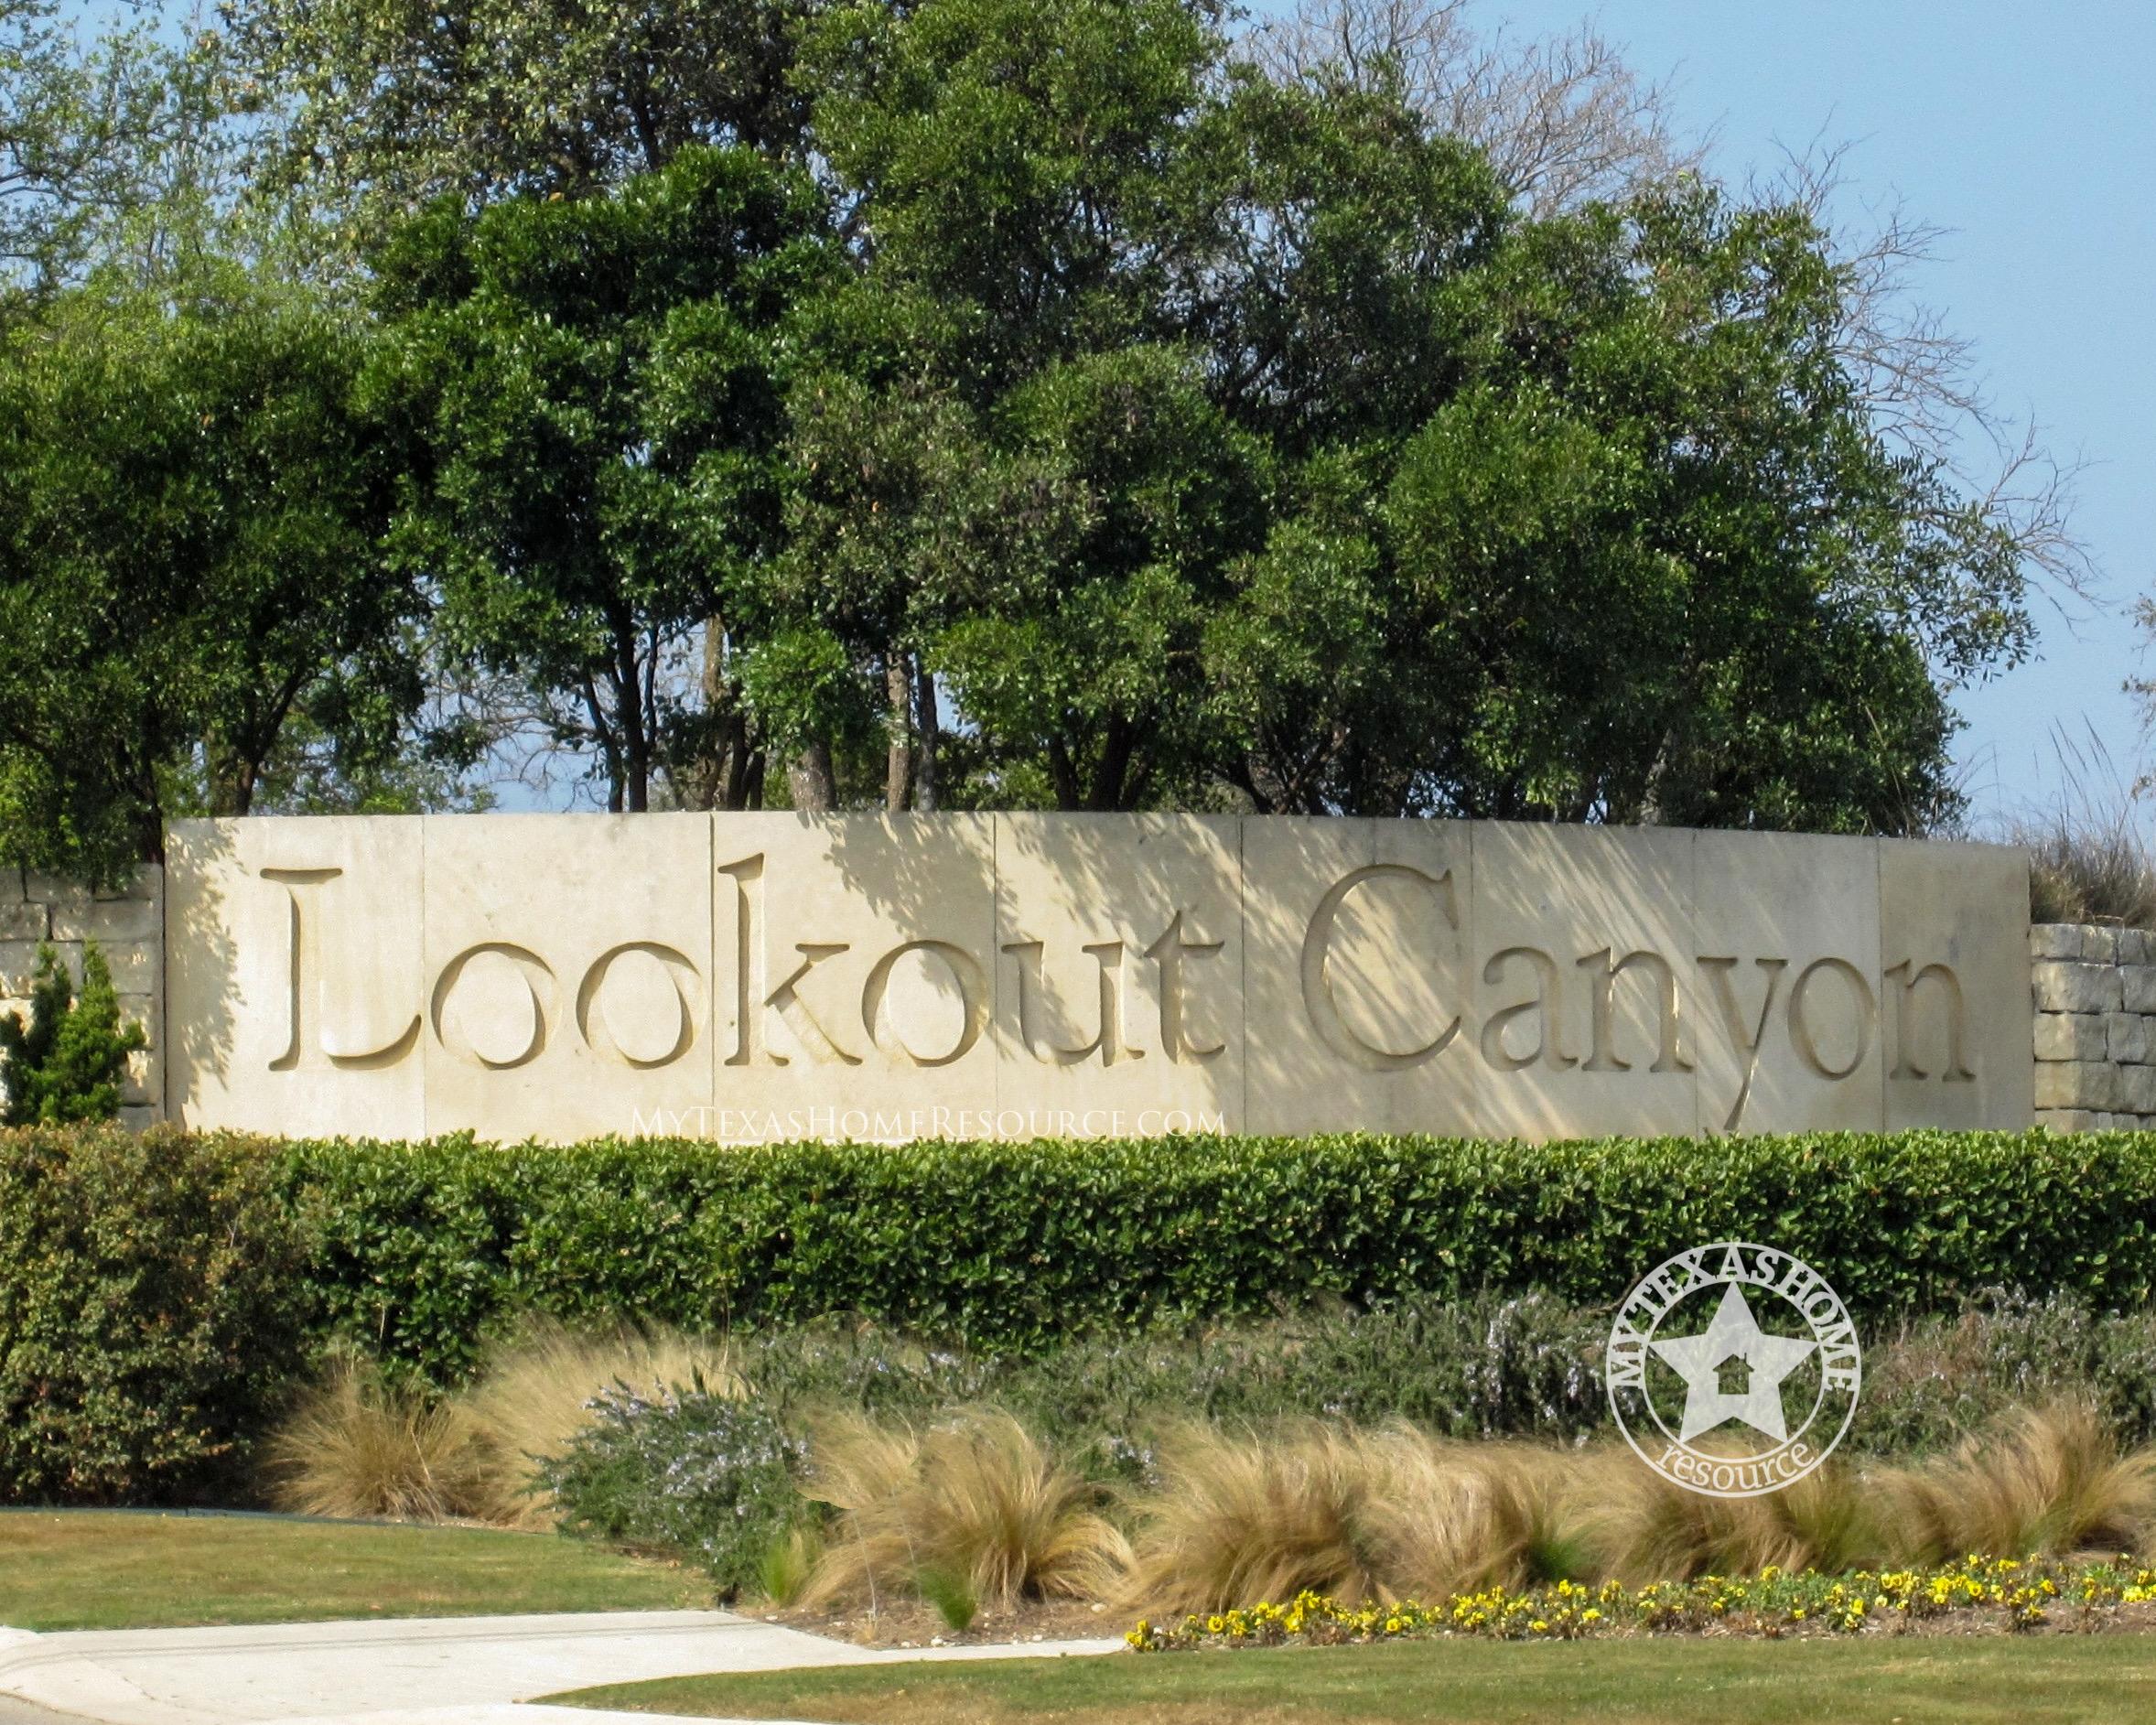 Lookout Canyon Community San Antonio, TX